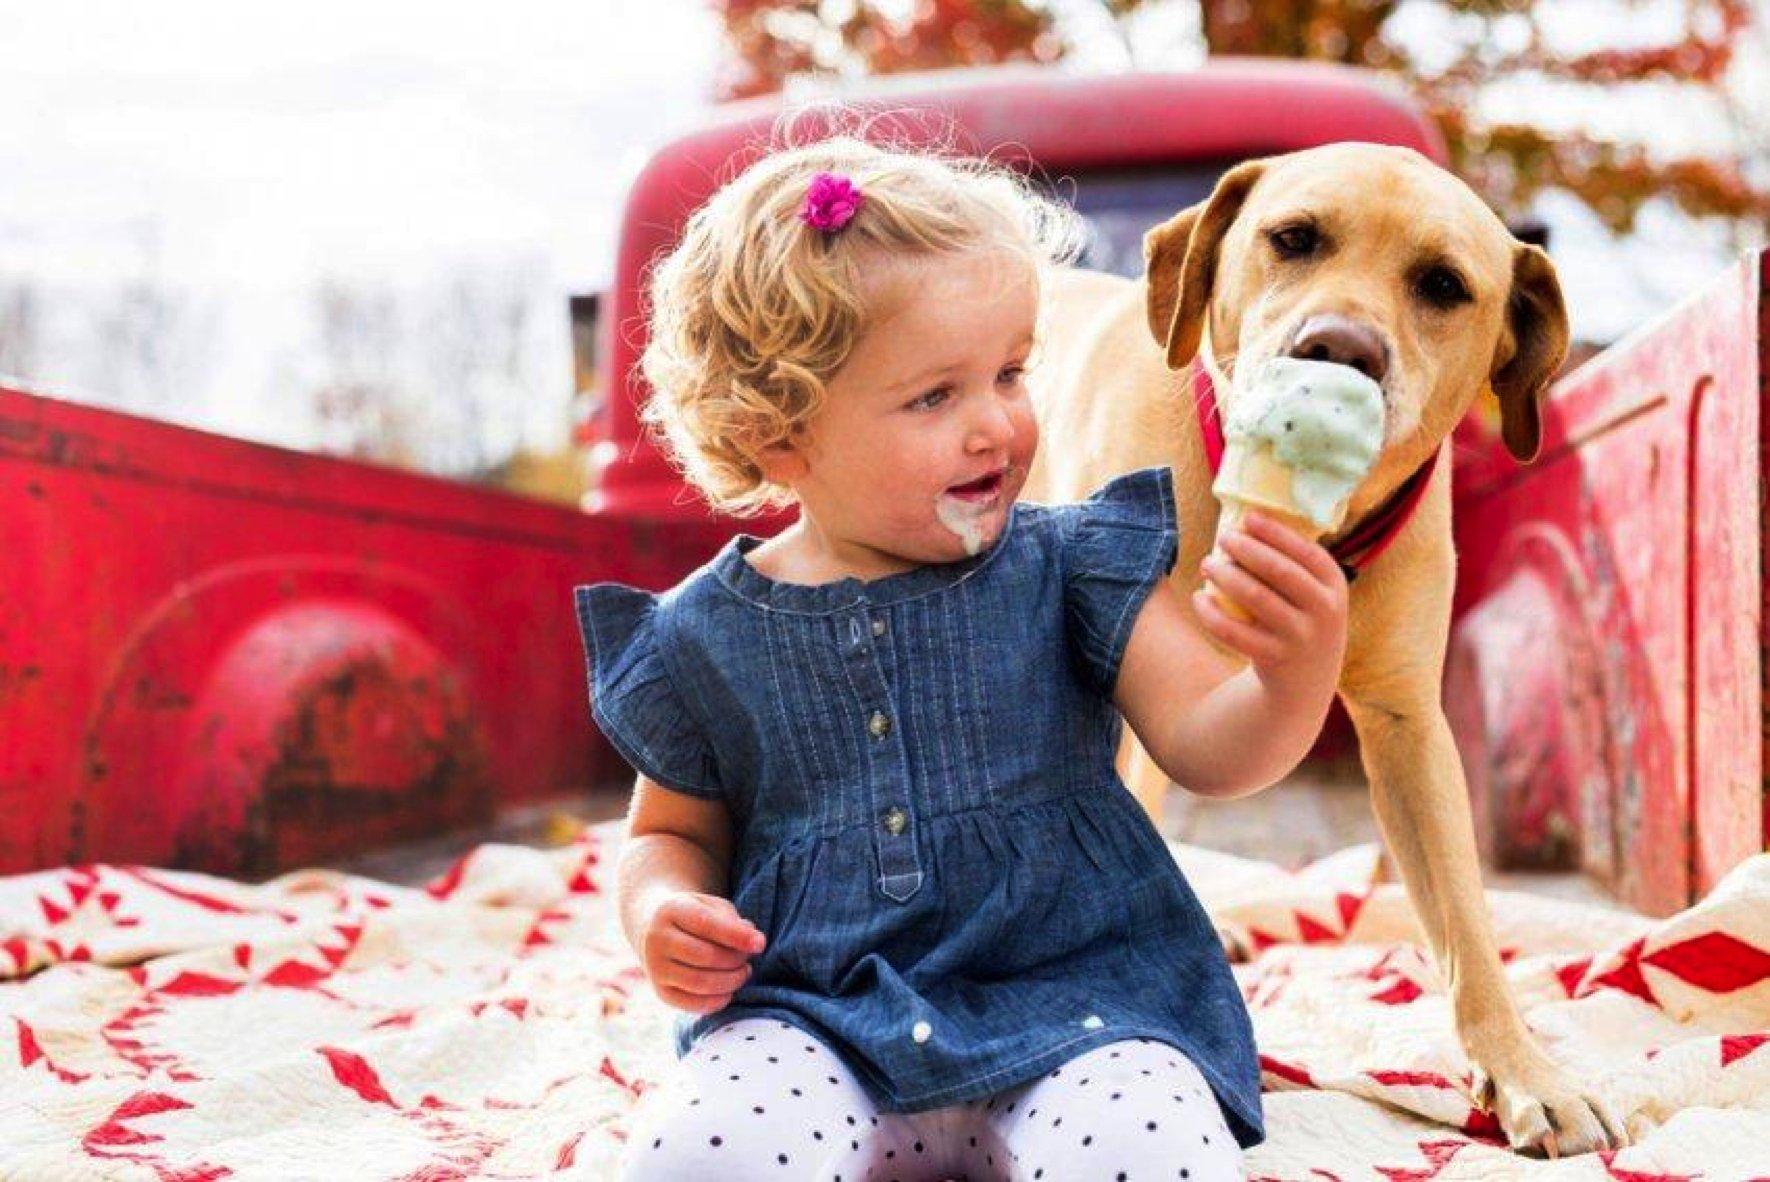 girl feeding ice cream to dog